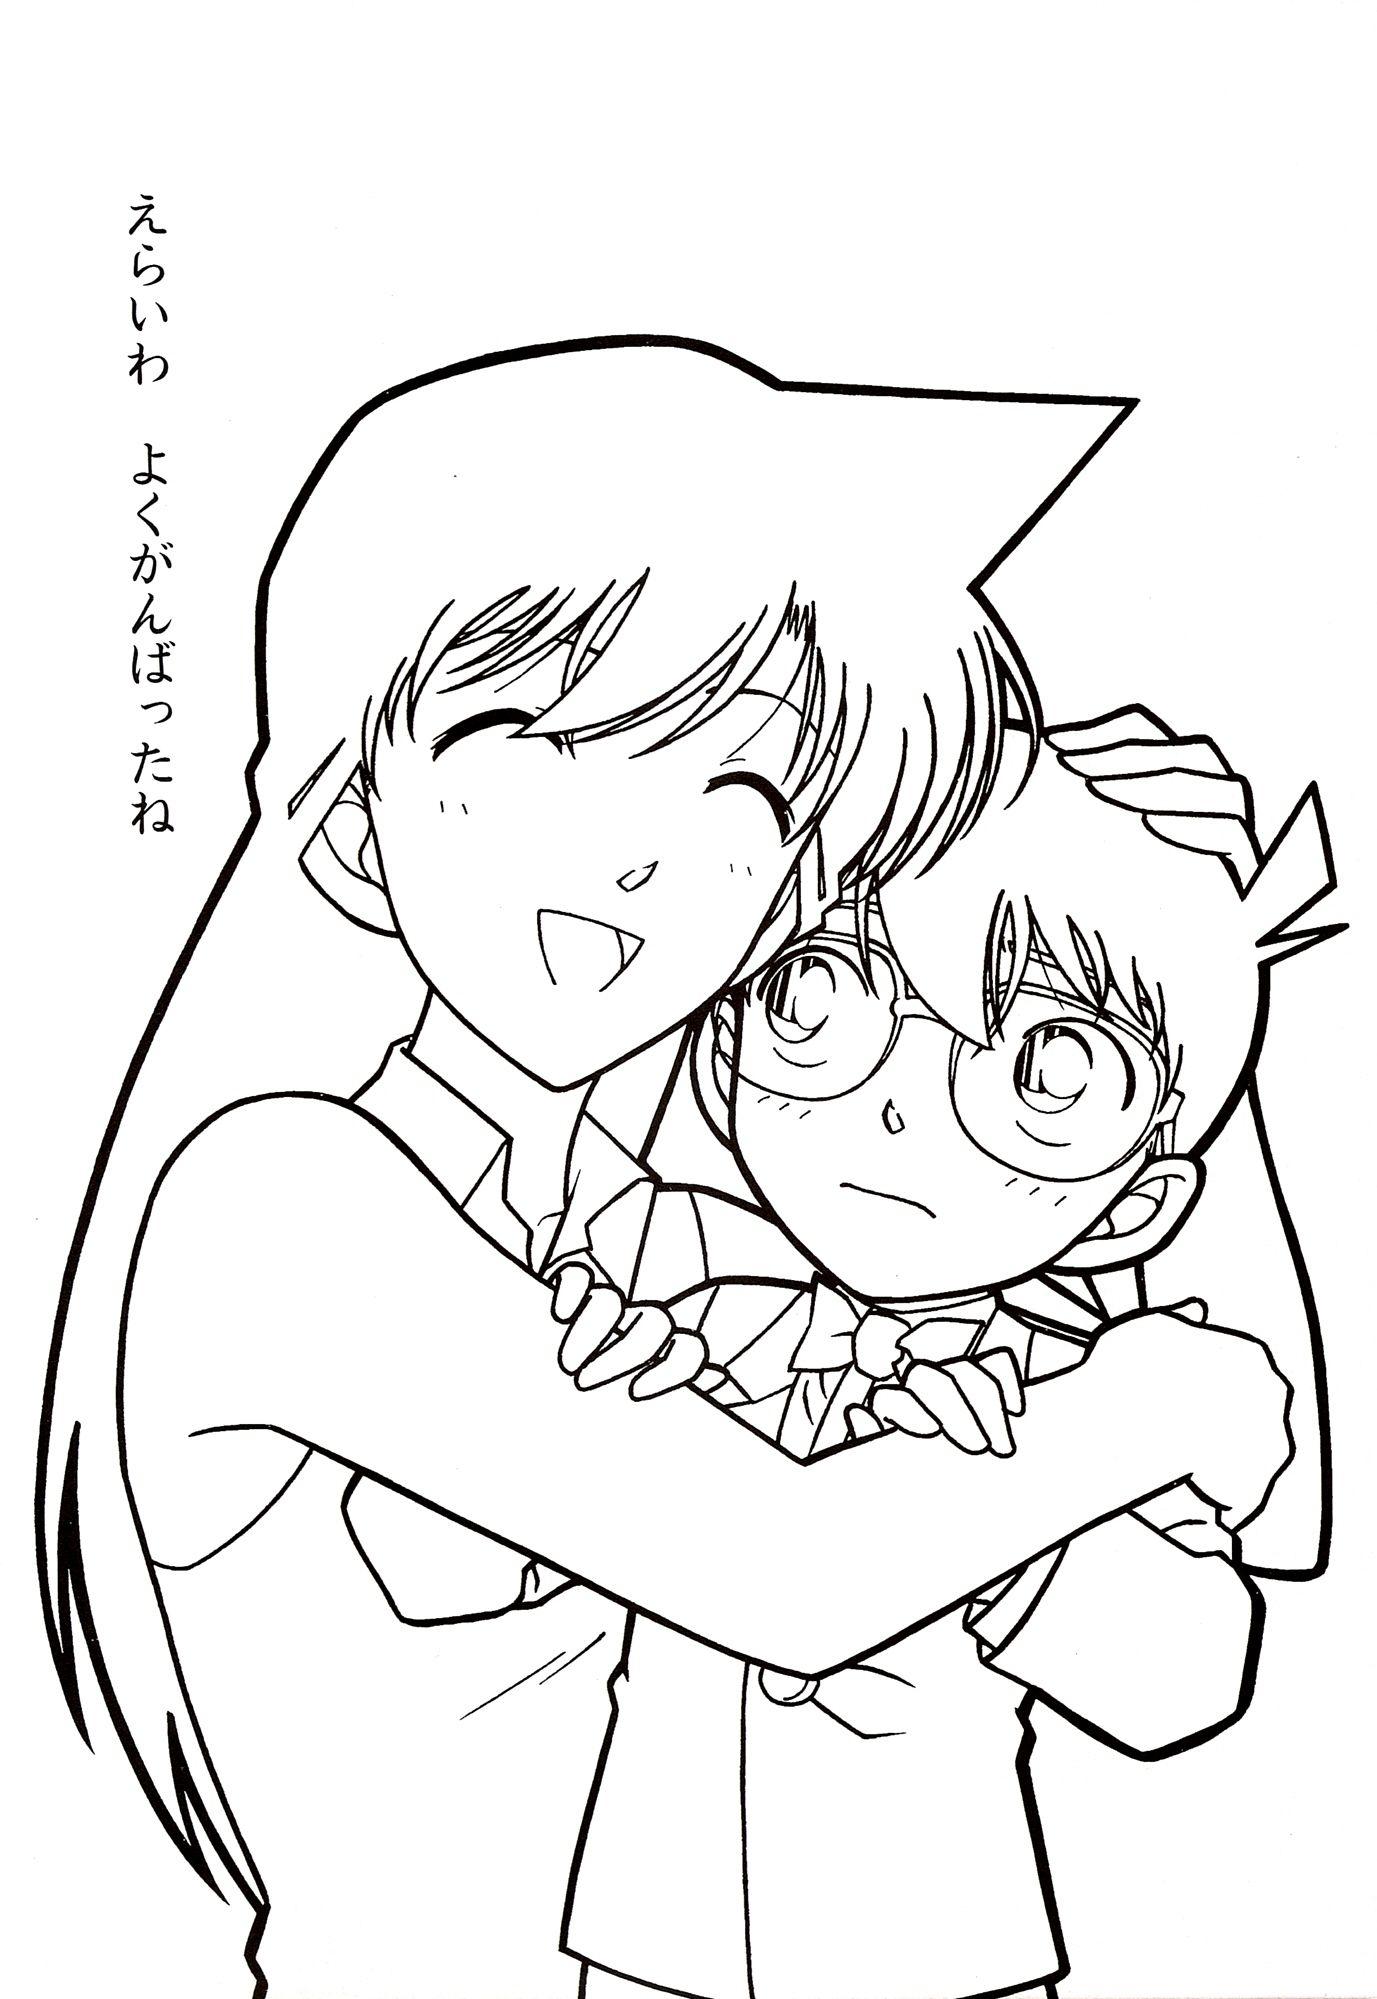 Detective_Conan_coloring_book035.jpg (1377×1999) ぬりえ, 無料